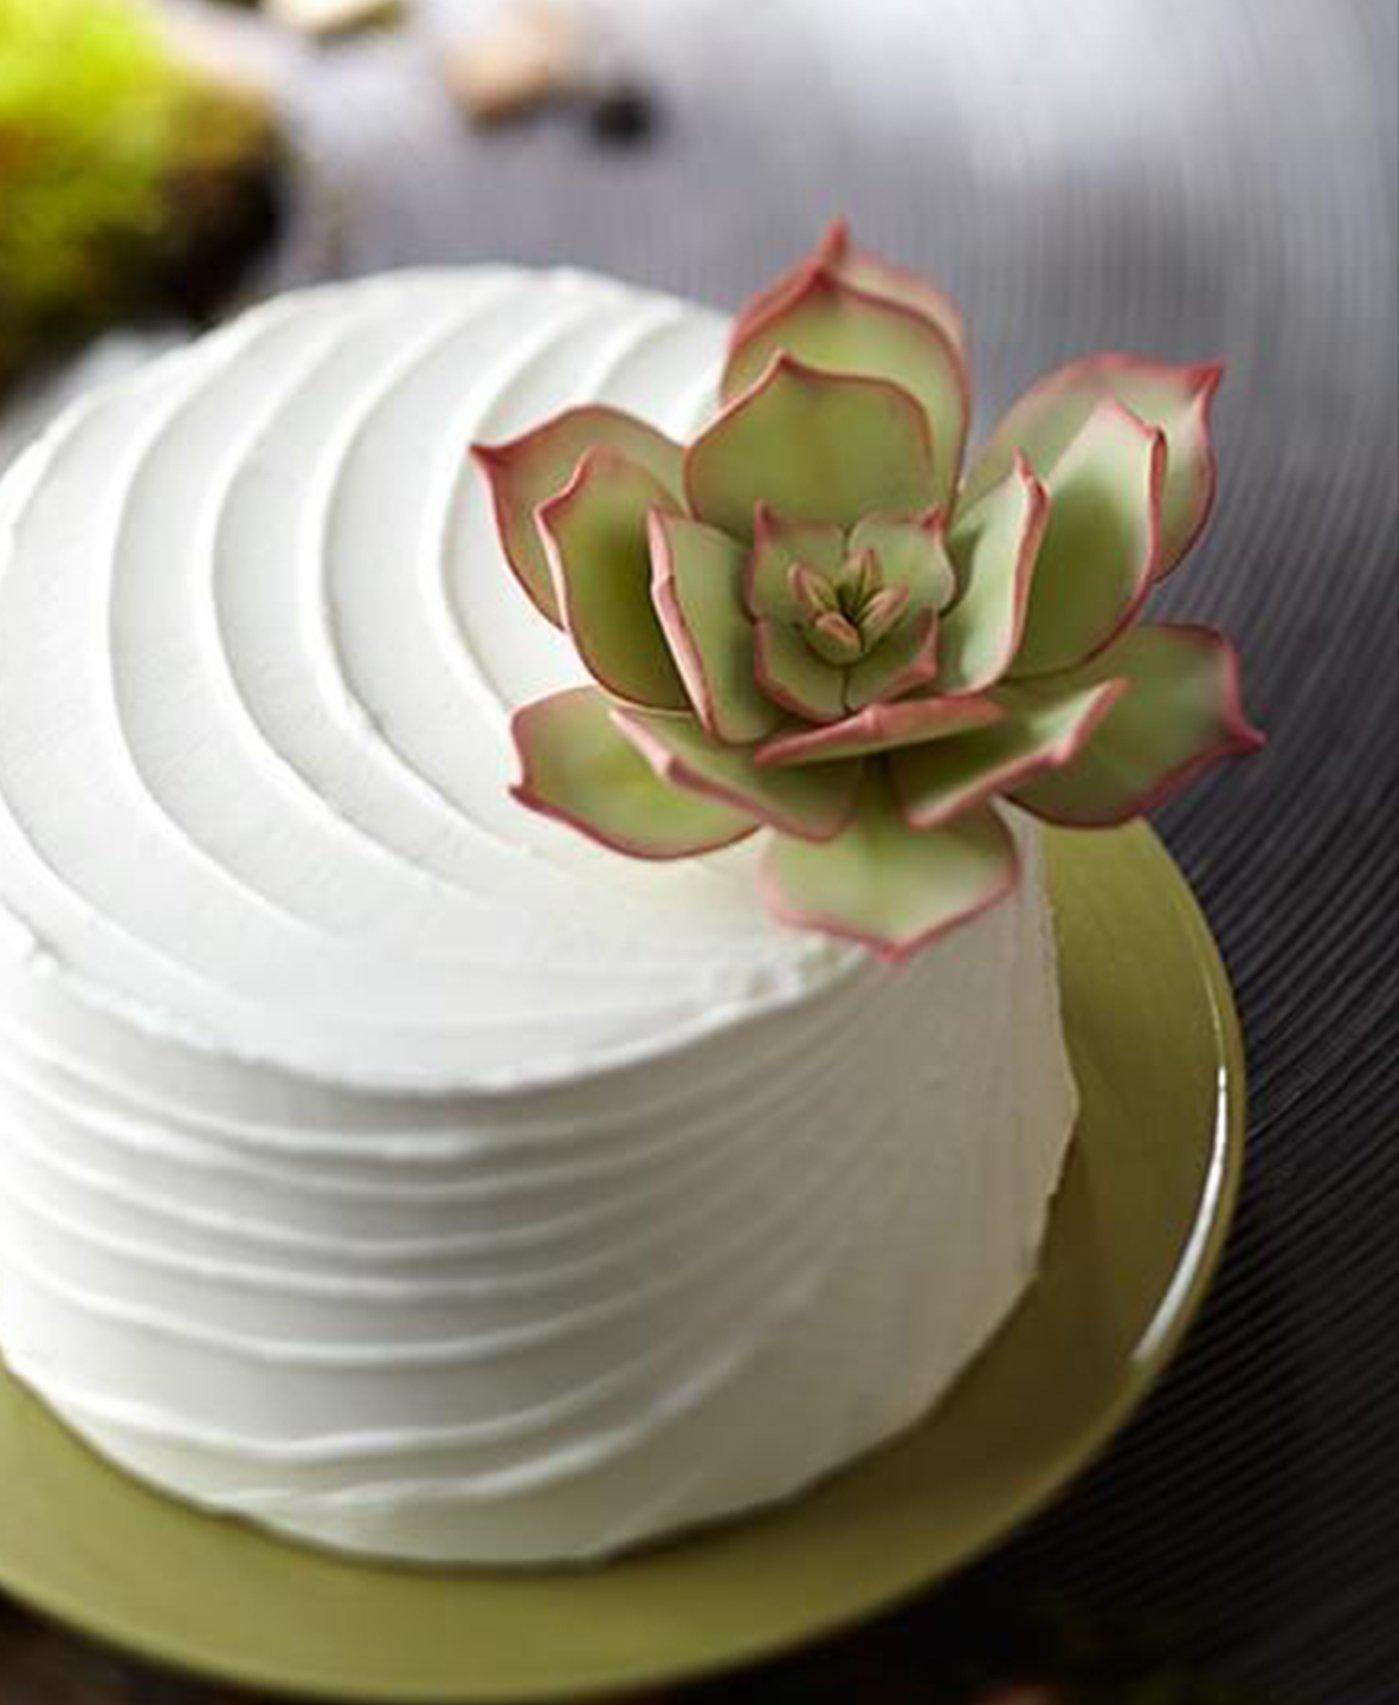 Astra Gourmet 6pcs Plastic Gum Paste Succulents Cut-Outs Set, Cake Decorating Mold Baking Tools(Assorted size)